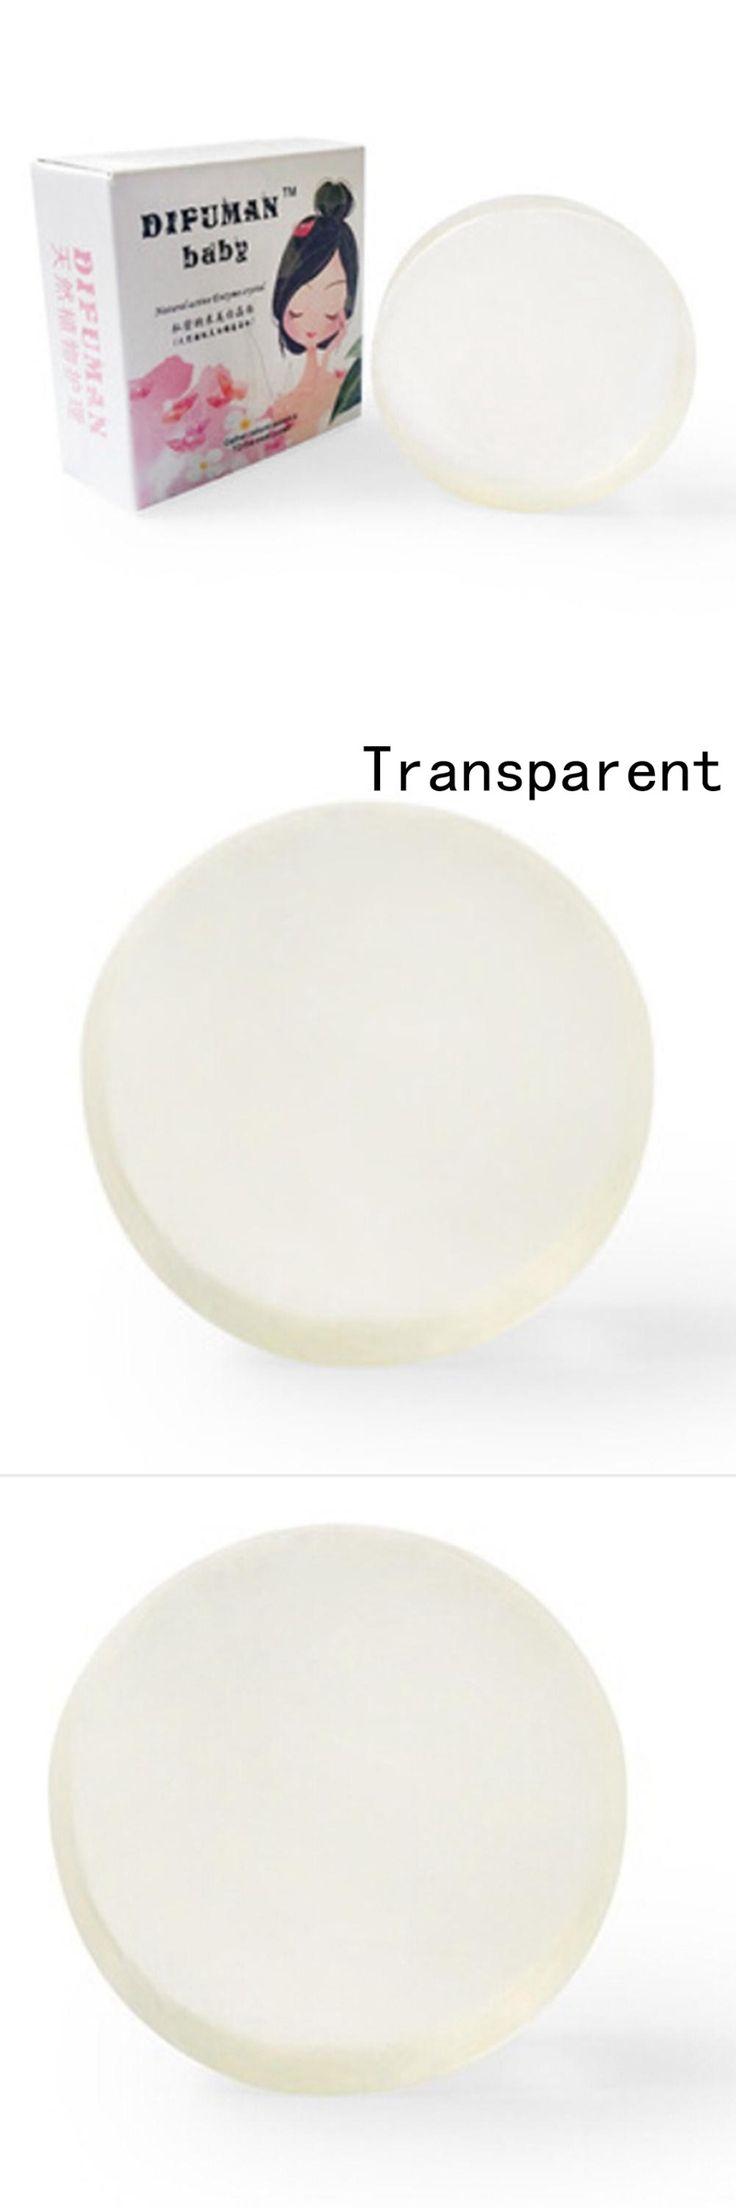 New 1PCS Natural active enzyme crystal skin whitening soap body skin whitening Handmade Soap